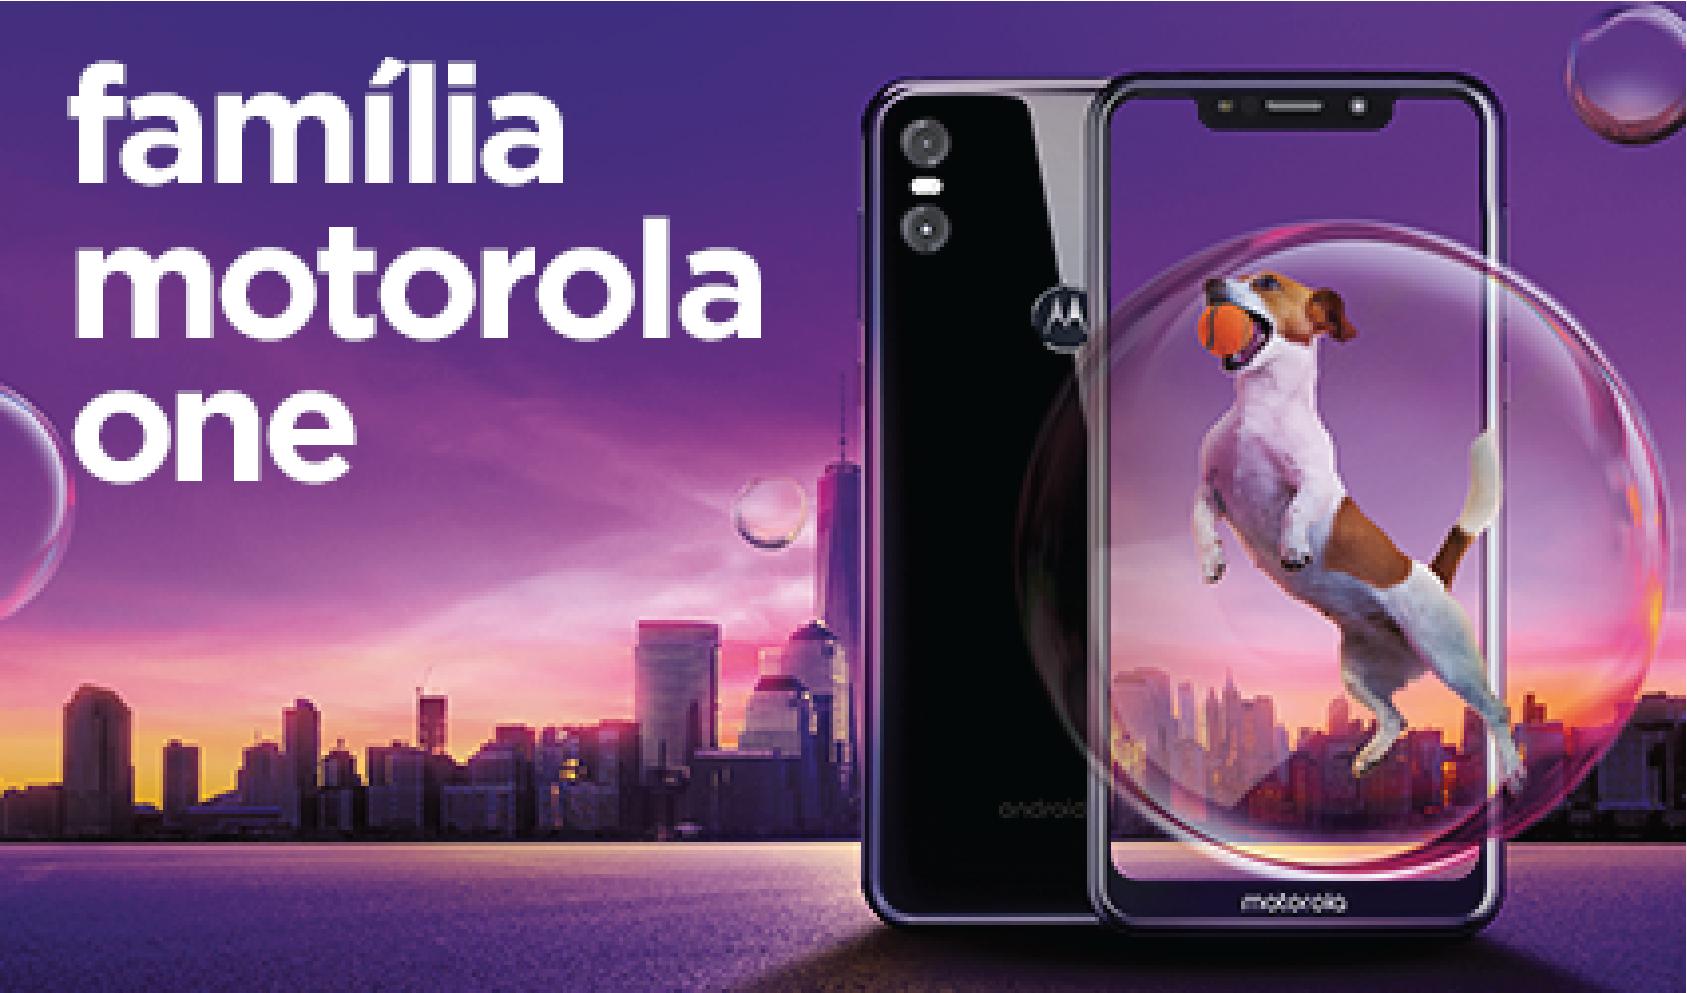 Família Motorola One